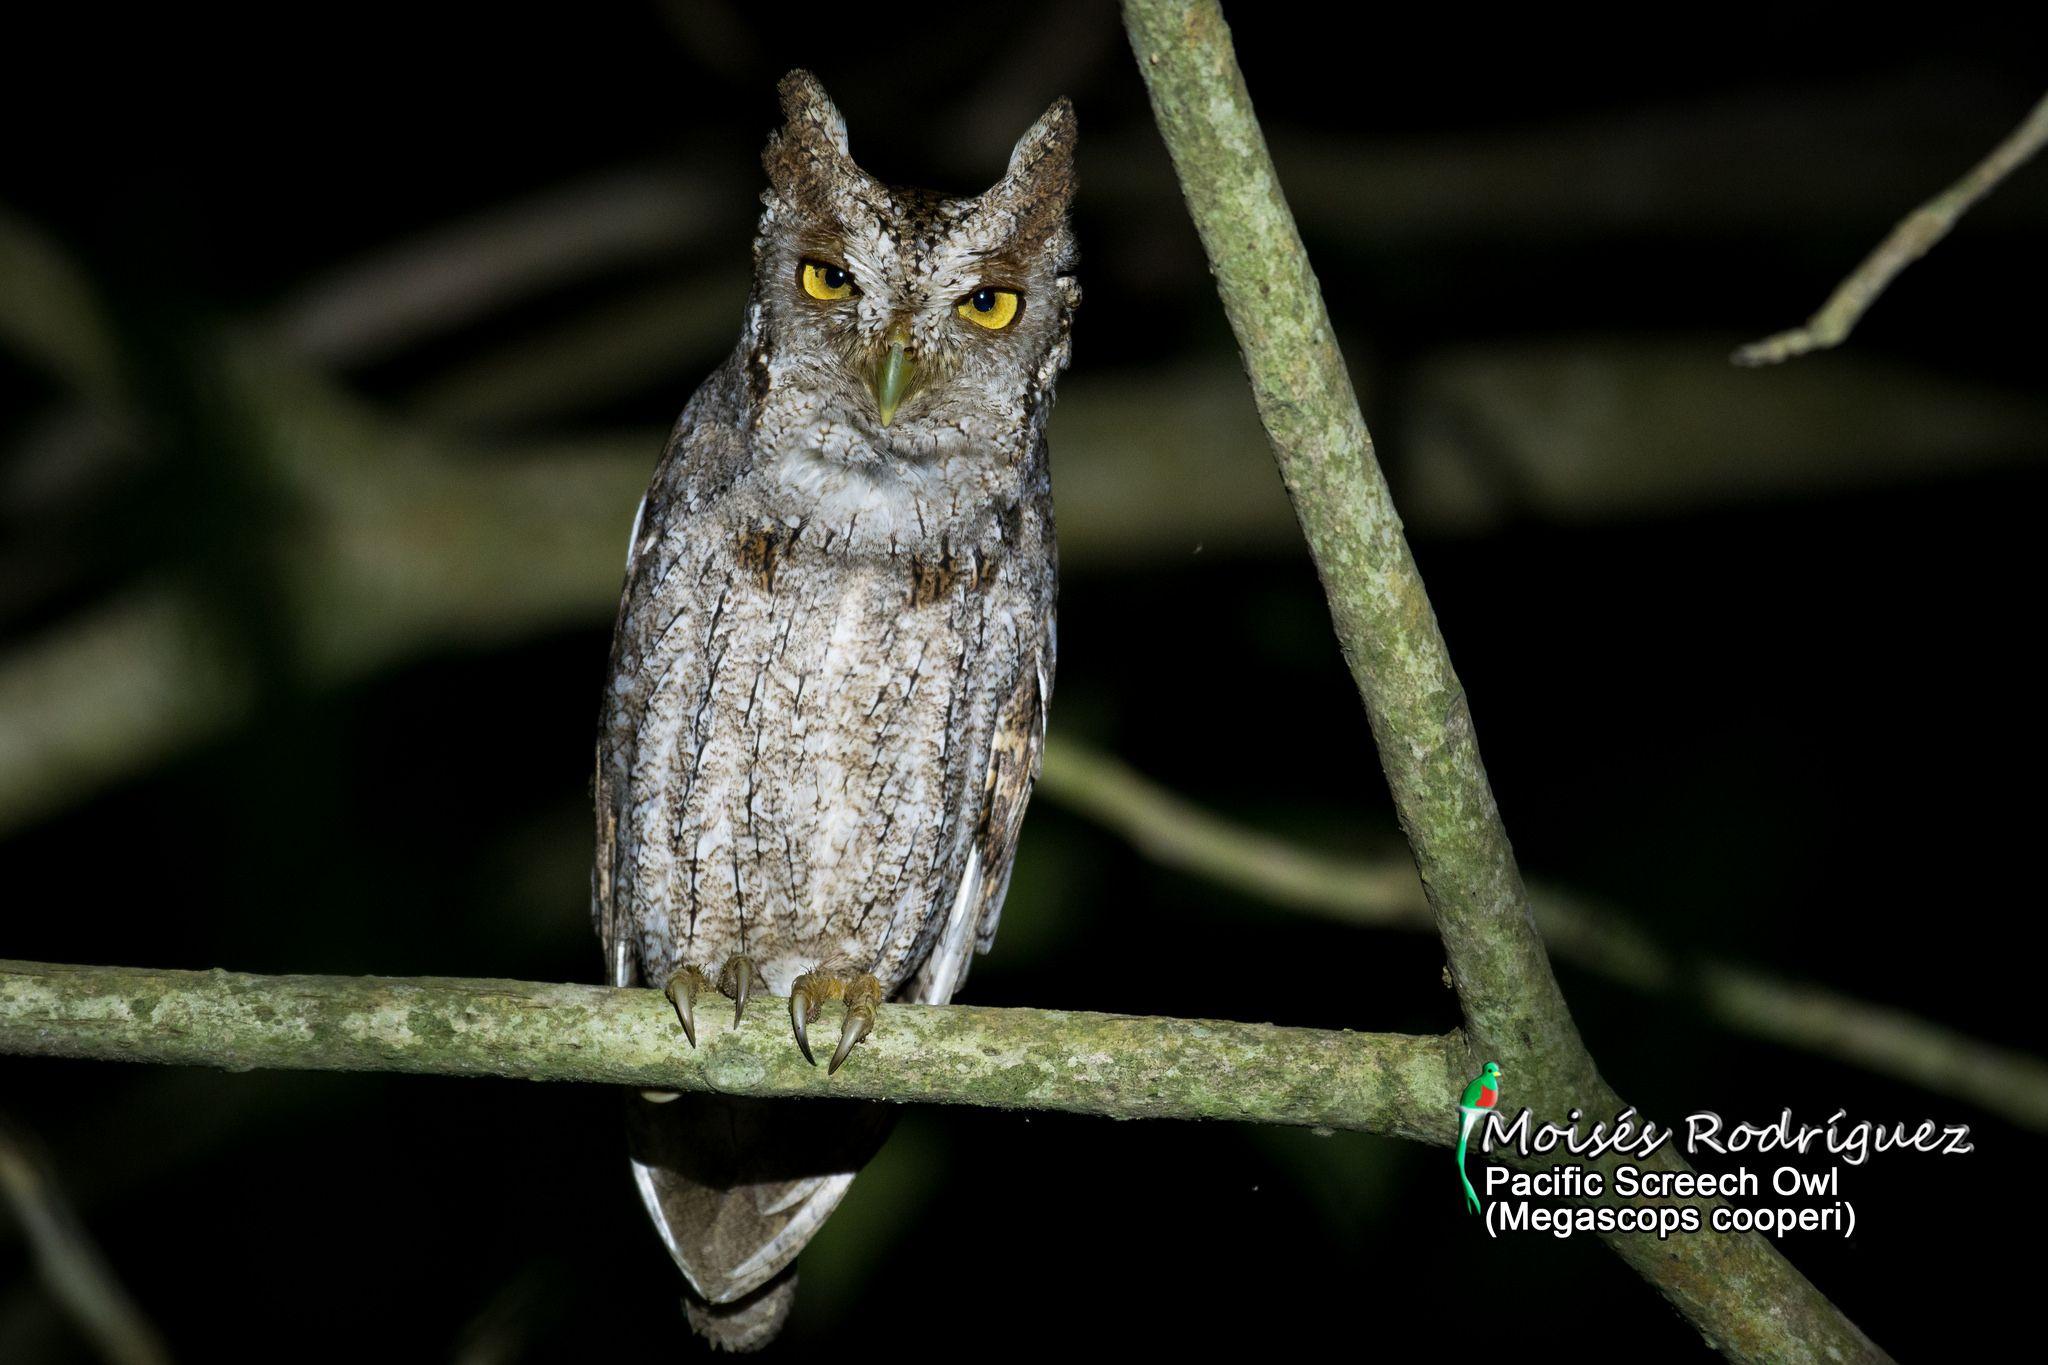 https://flic.kr/p/RACCjg   Pacific Screech Owl